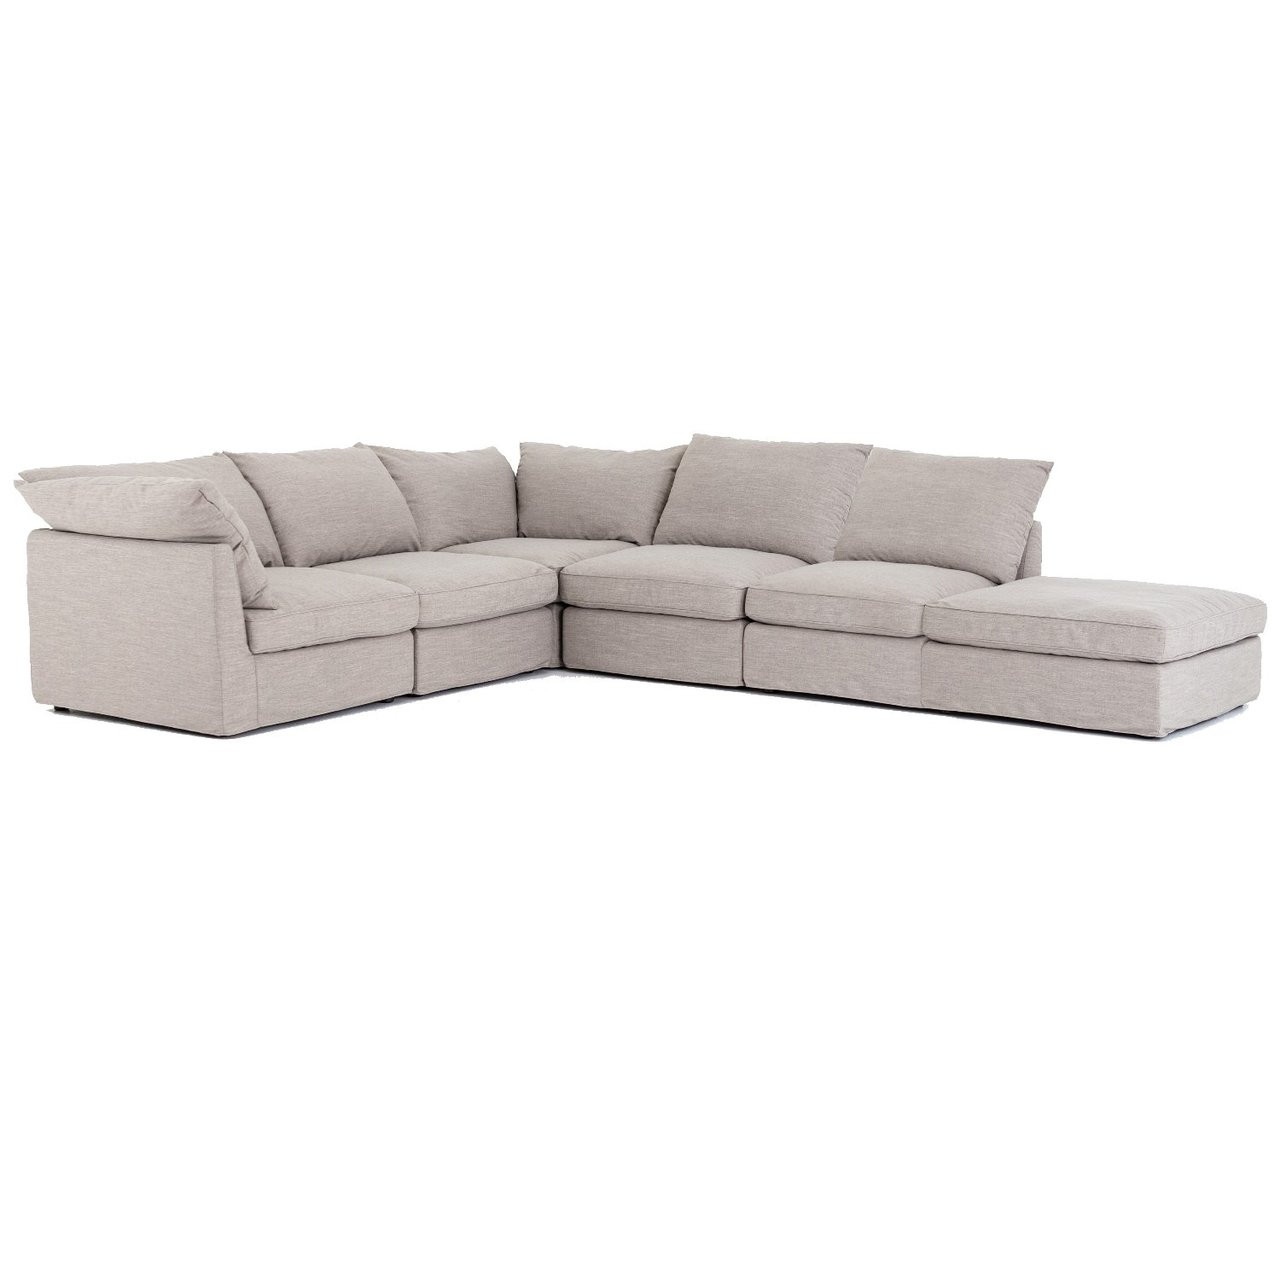 6 piece modular sectional sofa brown leather room decorating ideas paul coastal grey 148 zin home fourhands